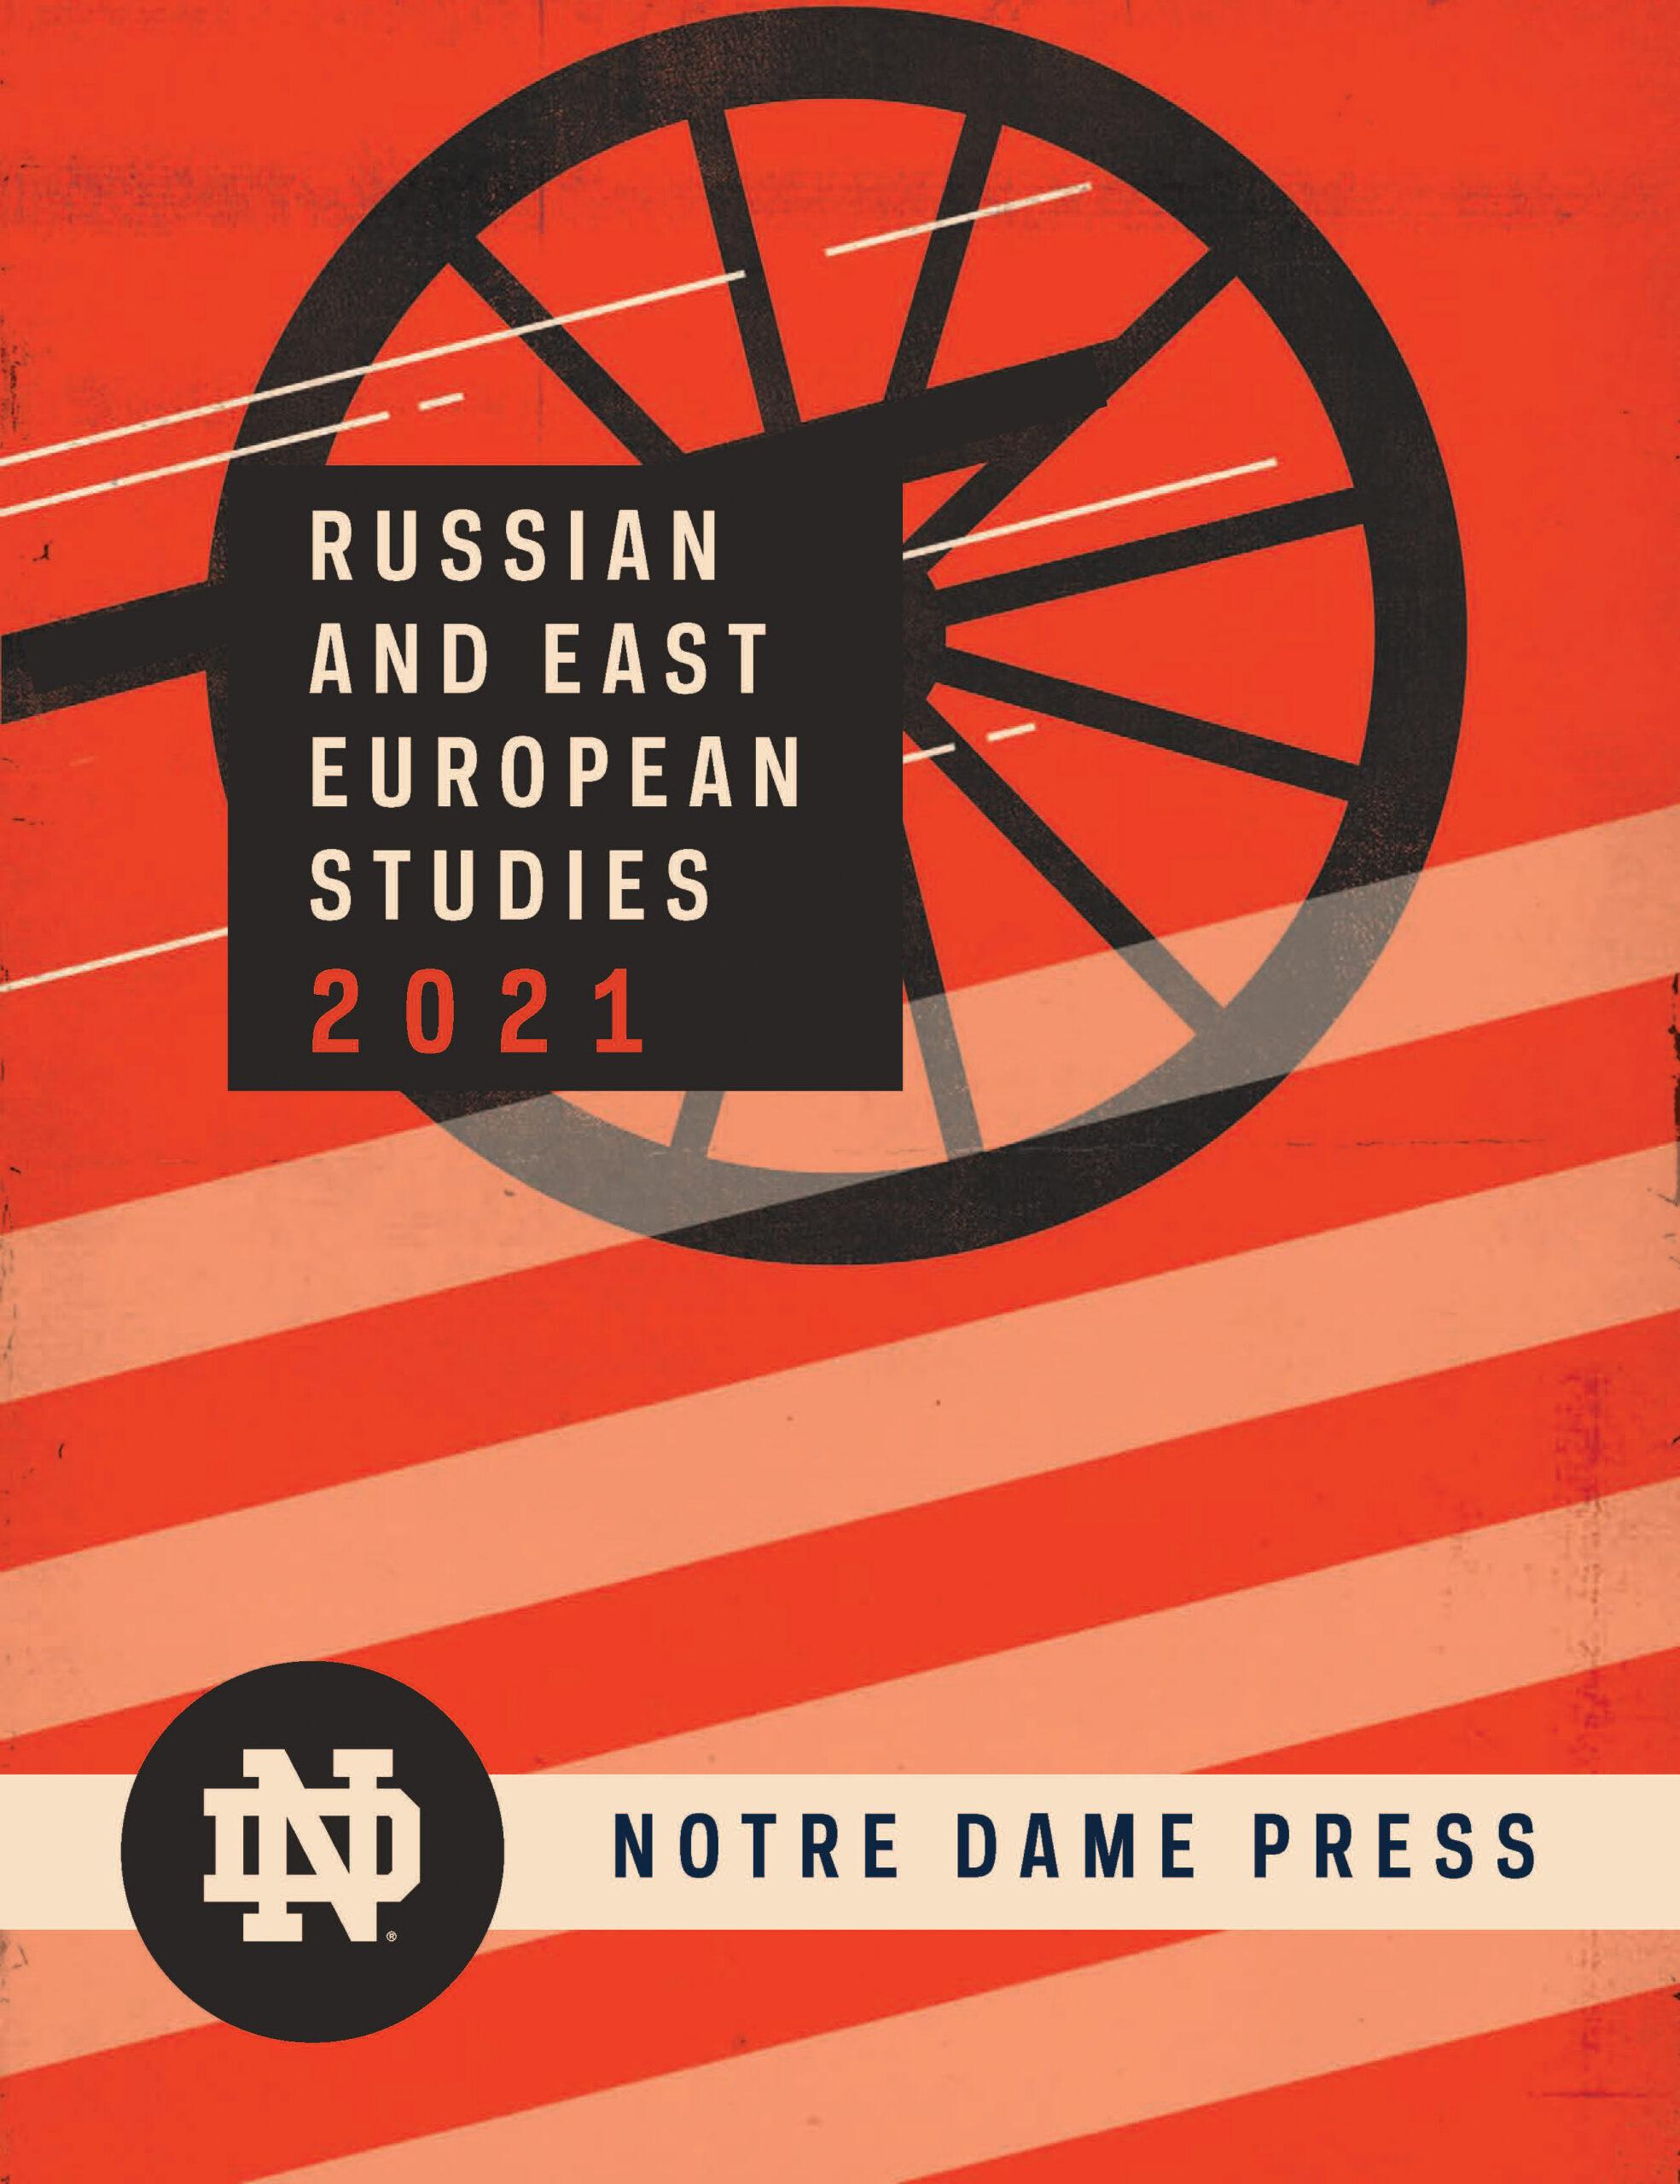 Russian and East European Studies 2021